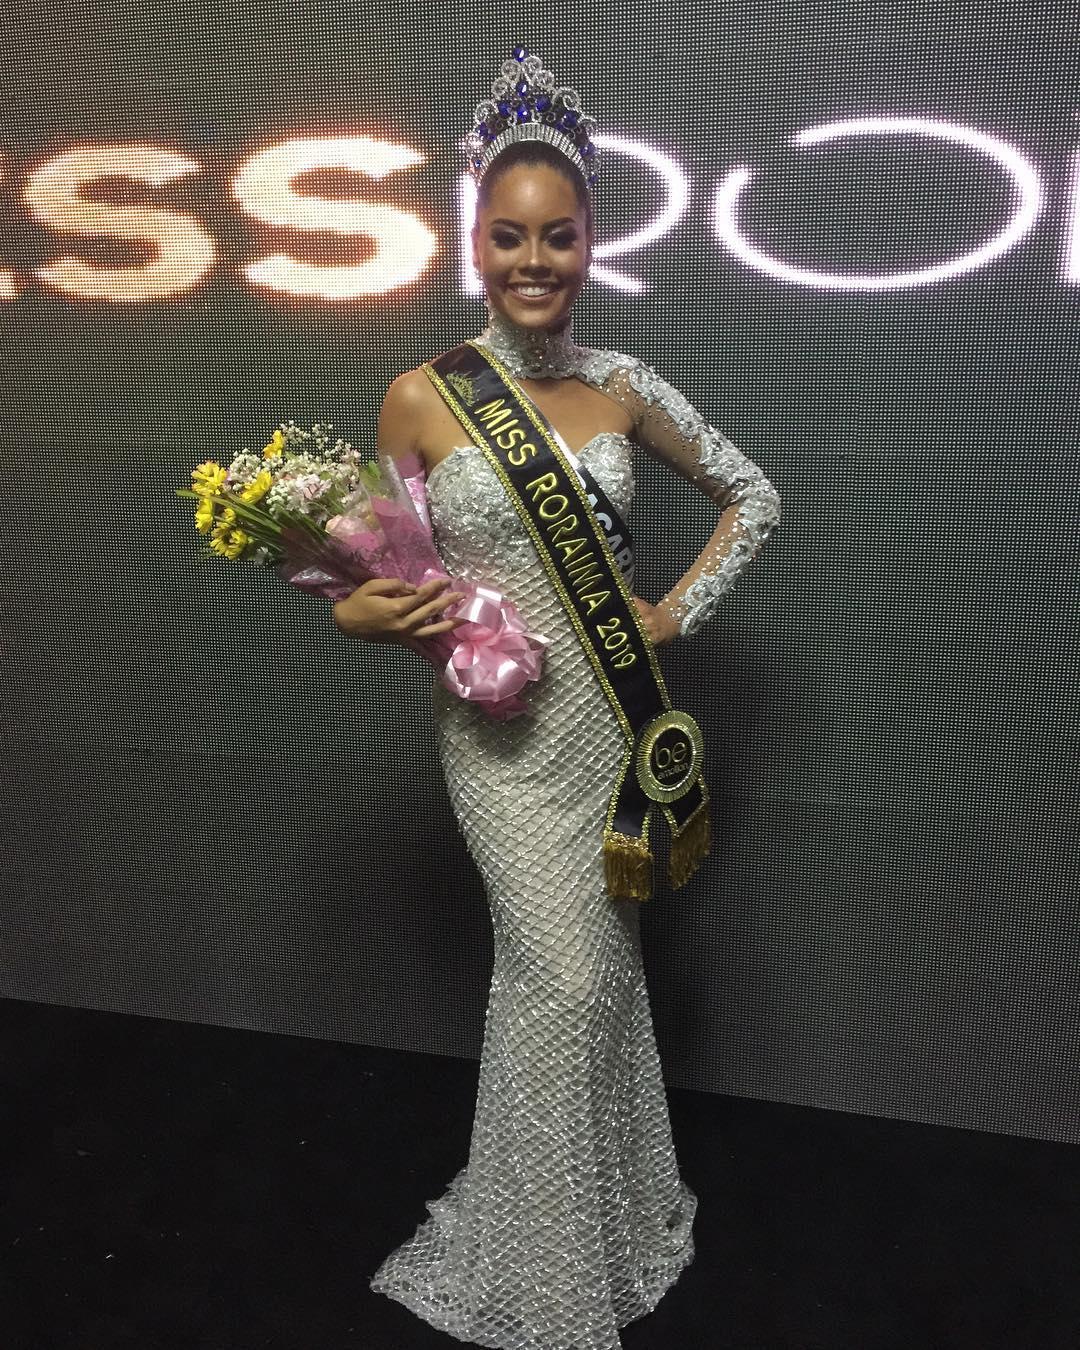 natali vitoria, miss roraima mundo 2020/top 15 de miss brasil universo 2019 /miss brasil teen universe 2017. primeira miss negra a vencer o miss roraima. - Página 8 50049711